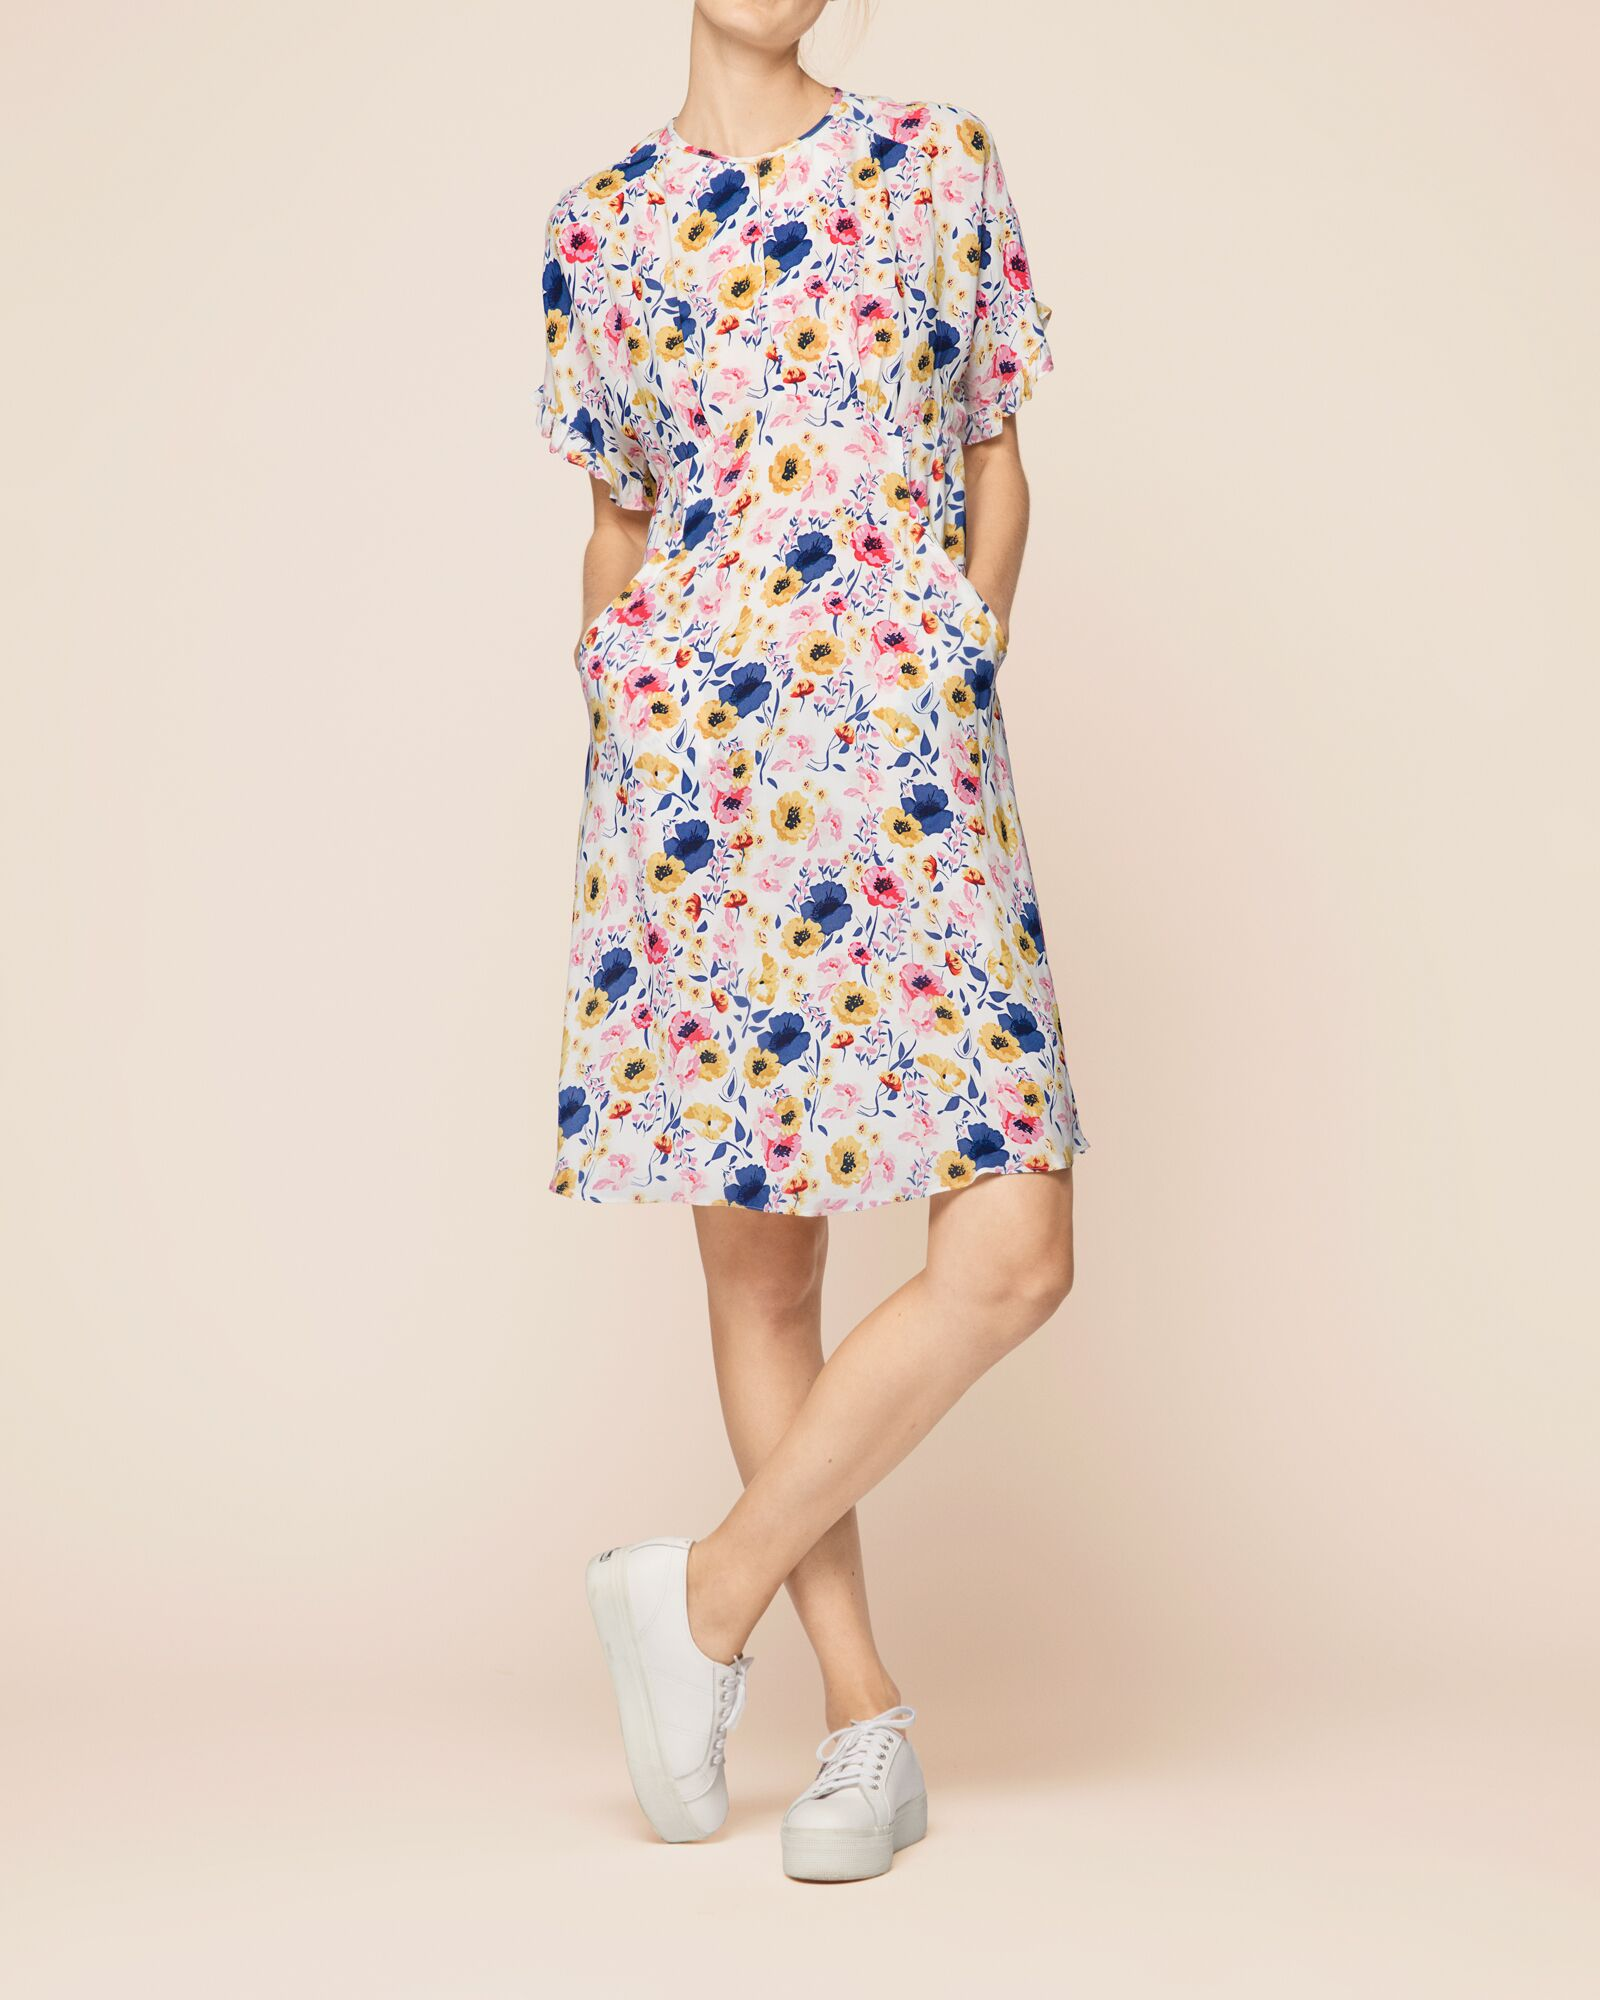 135b0630 BYTIMO - Vintage Drape Day Dress - Feel Good Store